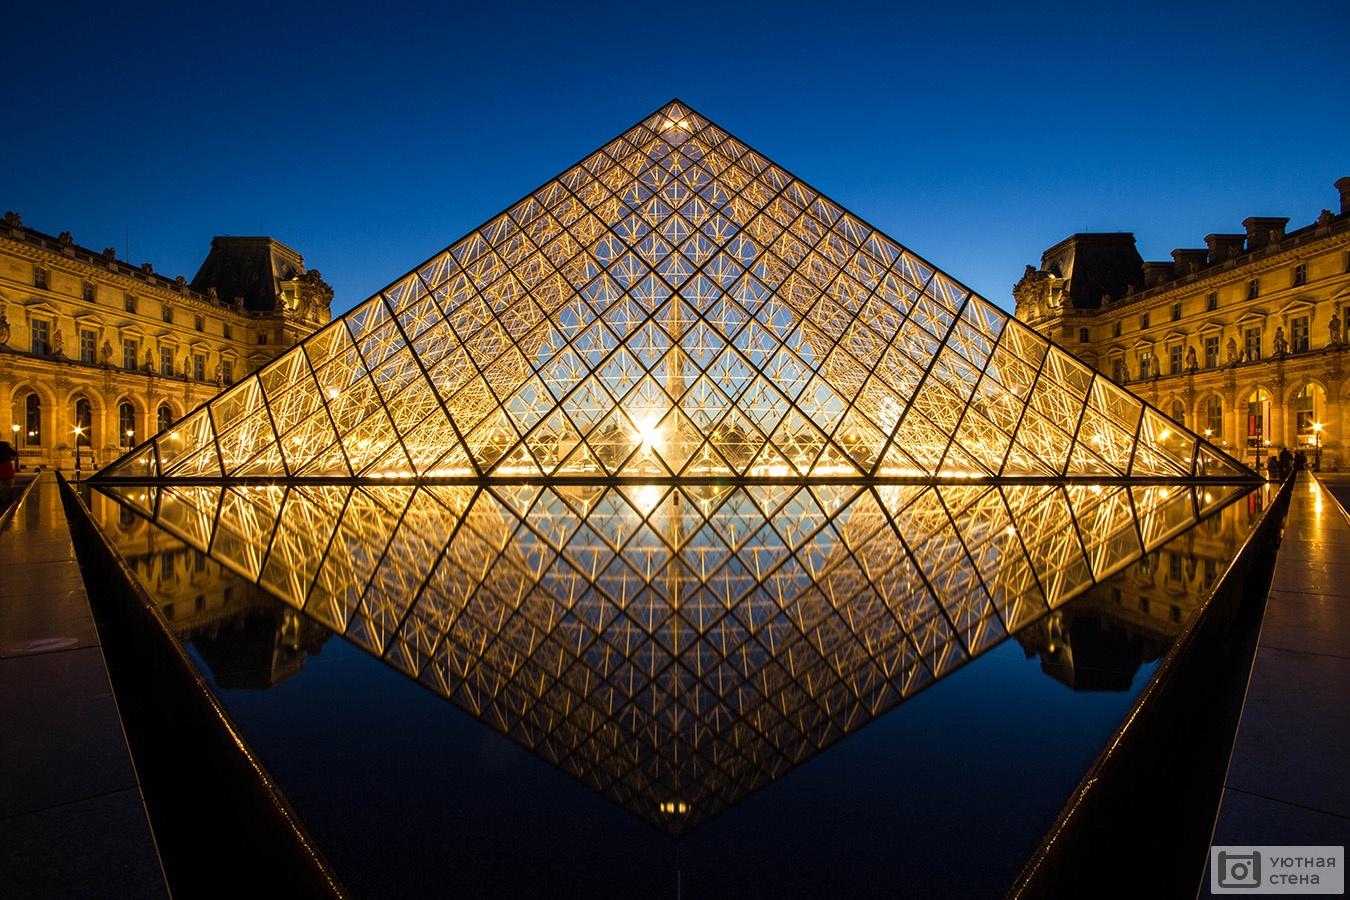 фото с пирамидой лувра ситуации, которые требуют